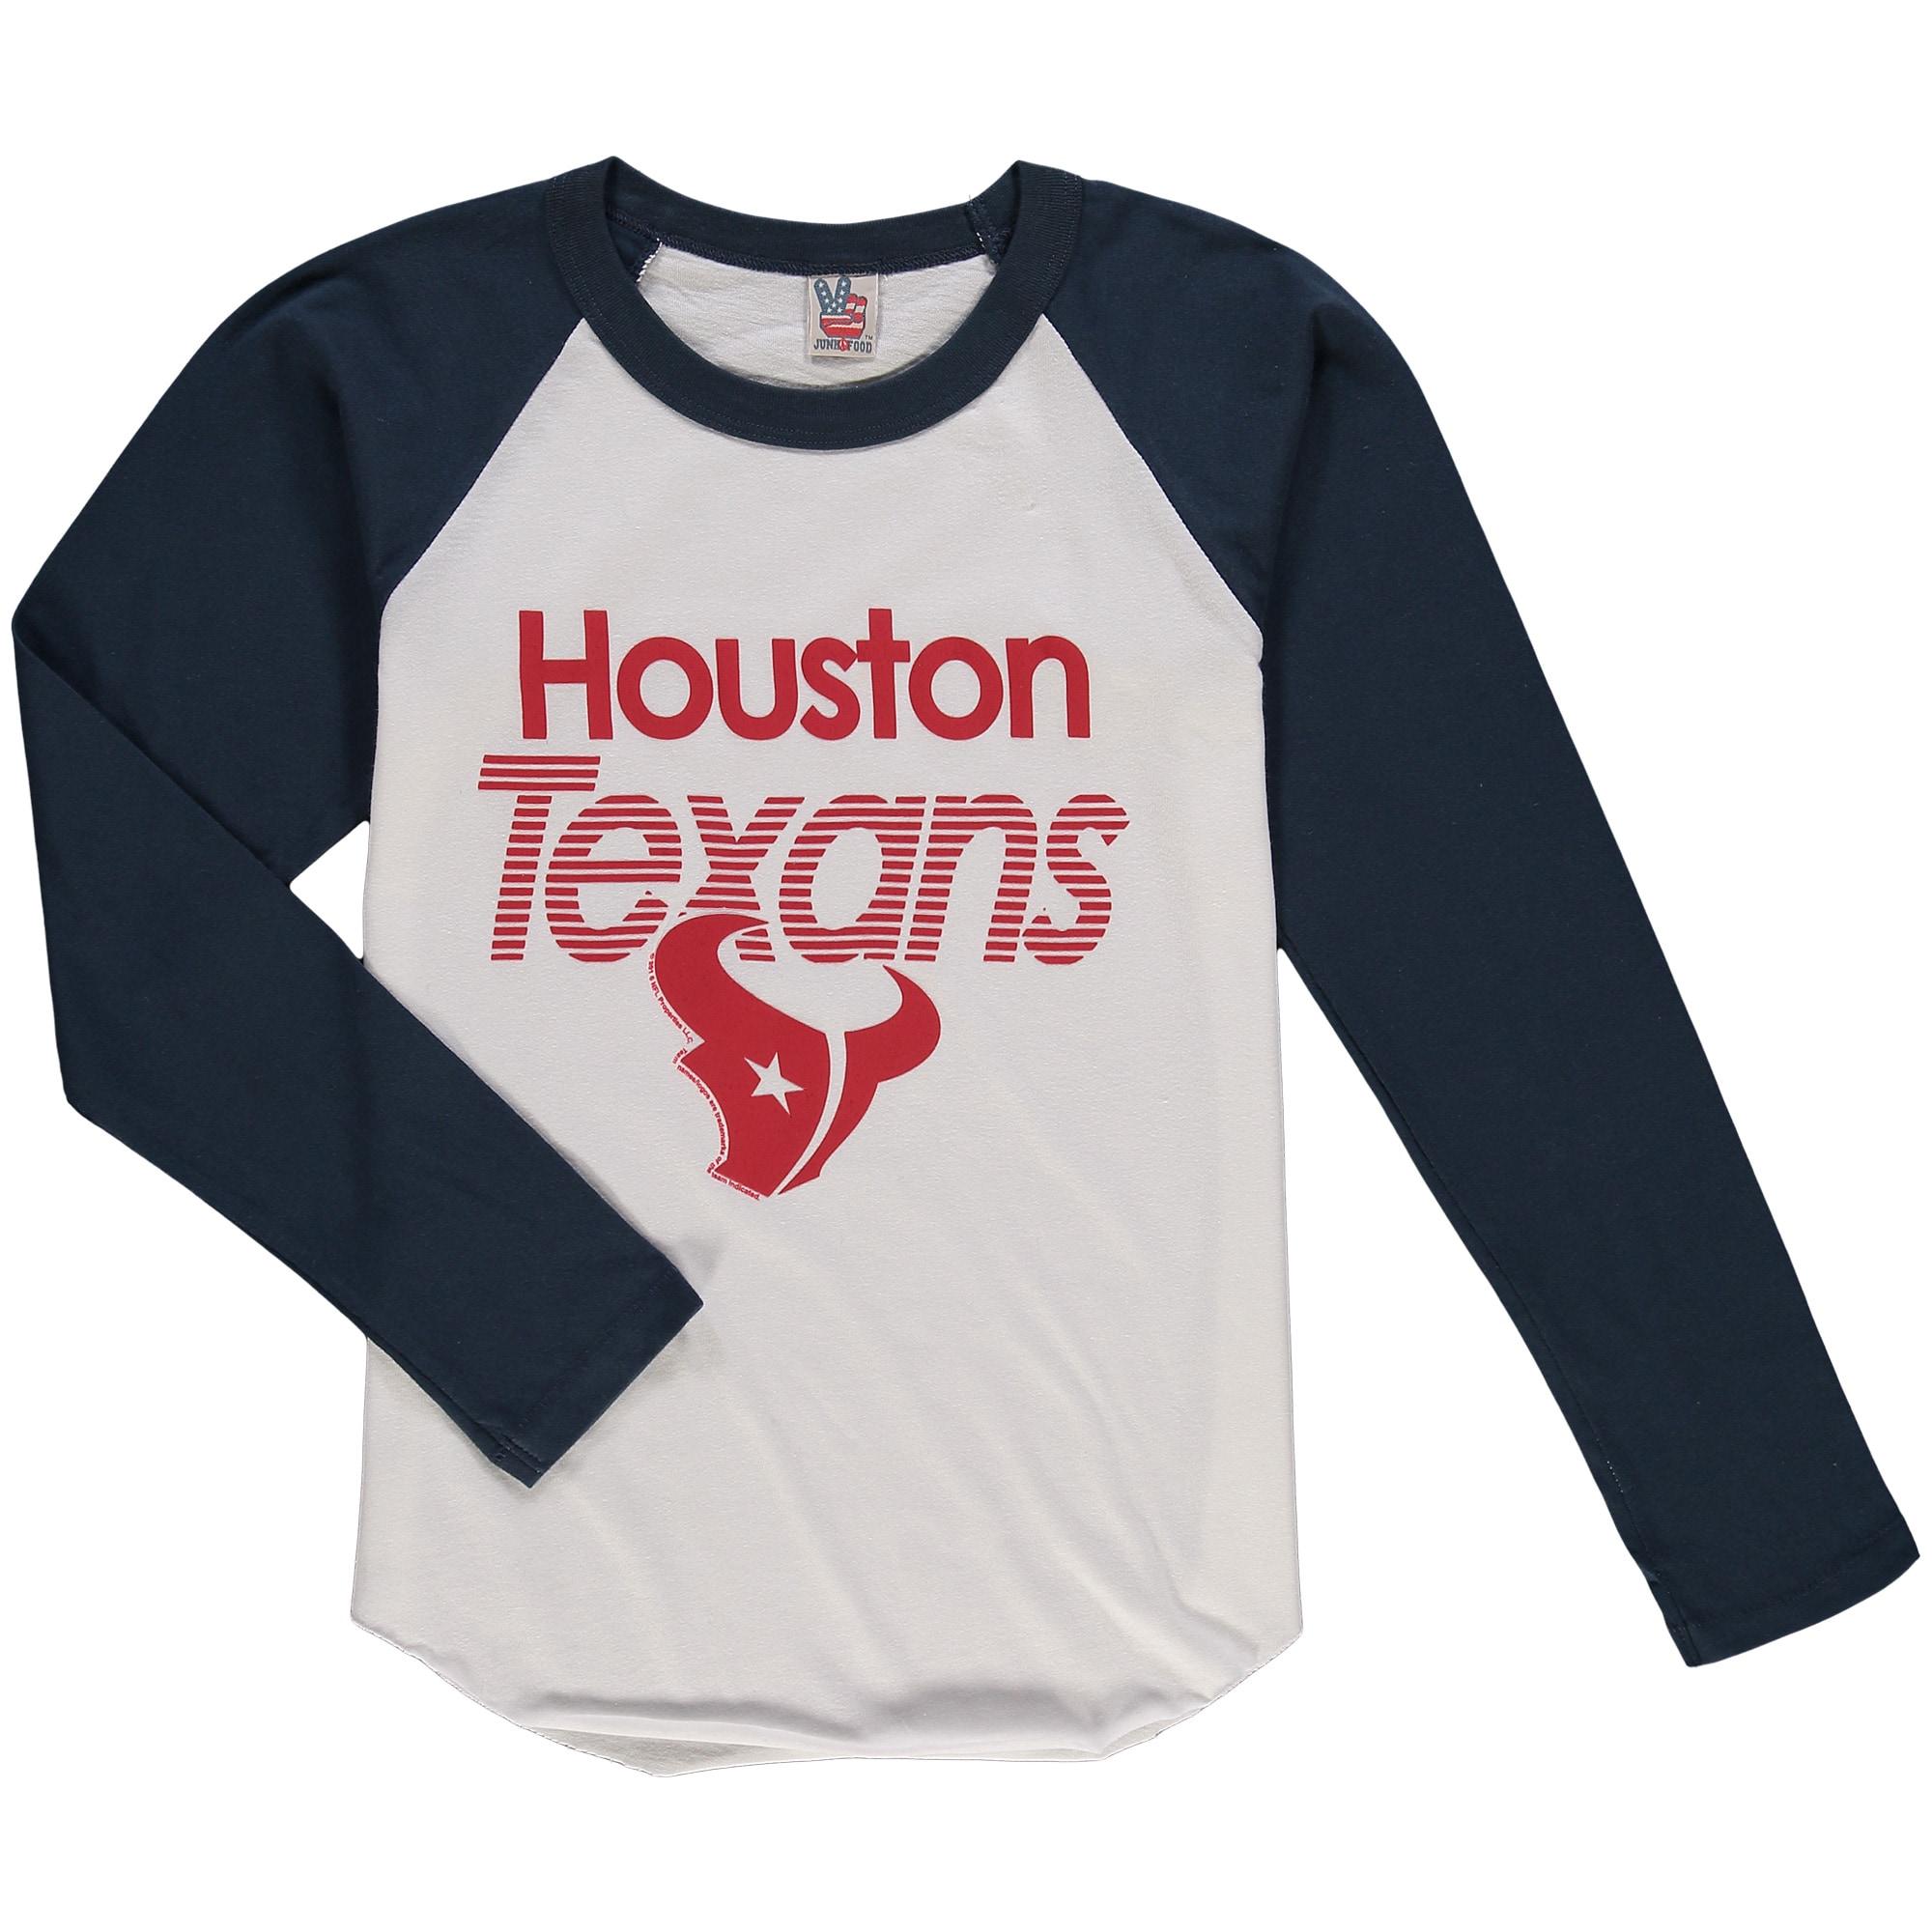 Houston Texans Junk Food Youth All American Long Sleeve Raglan T-Shirt - White/Navy